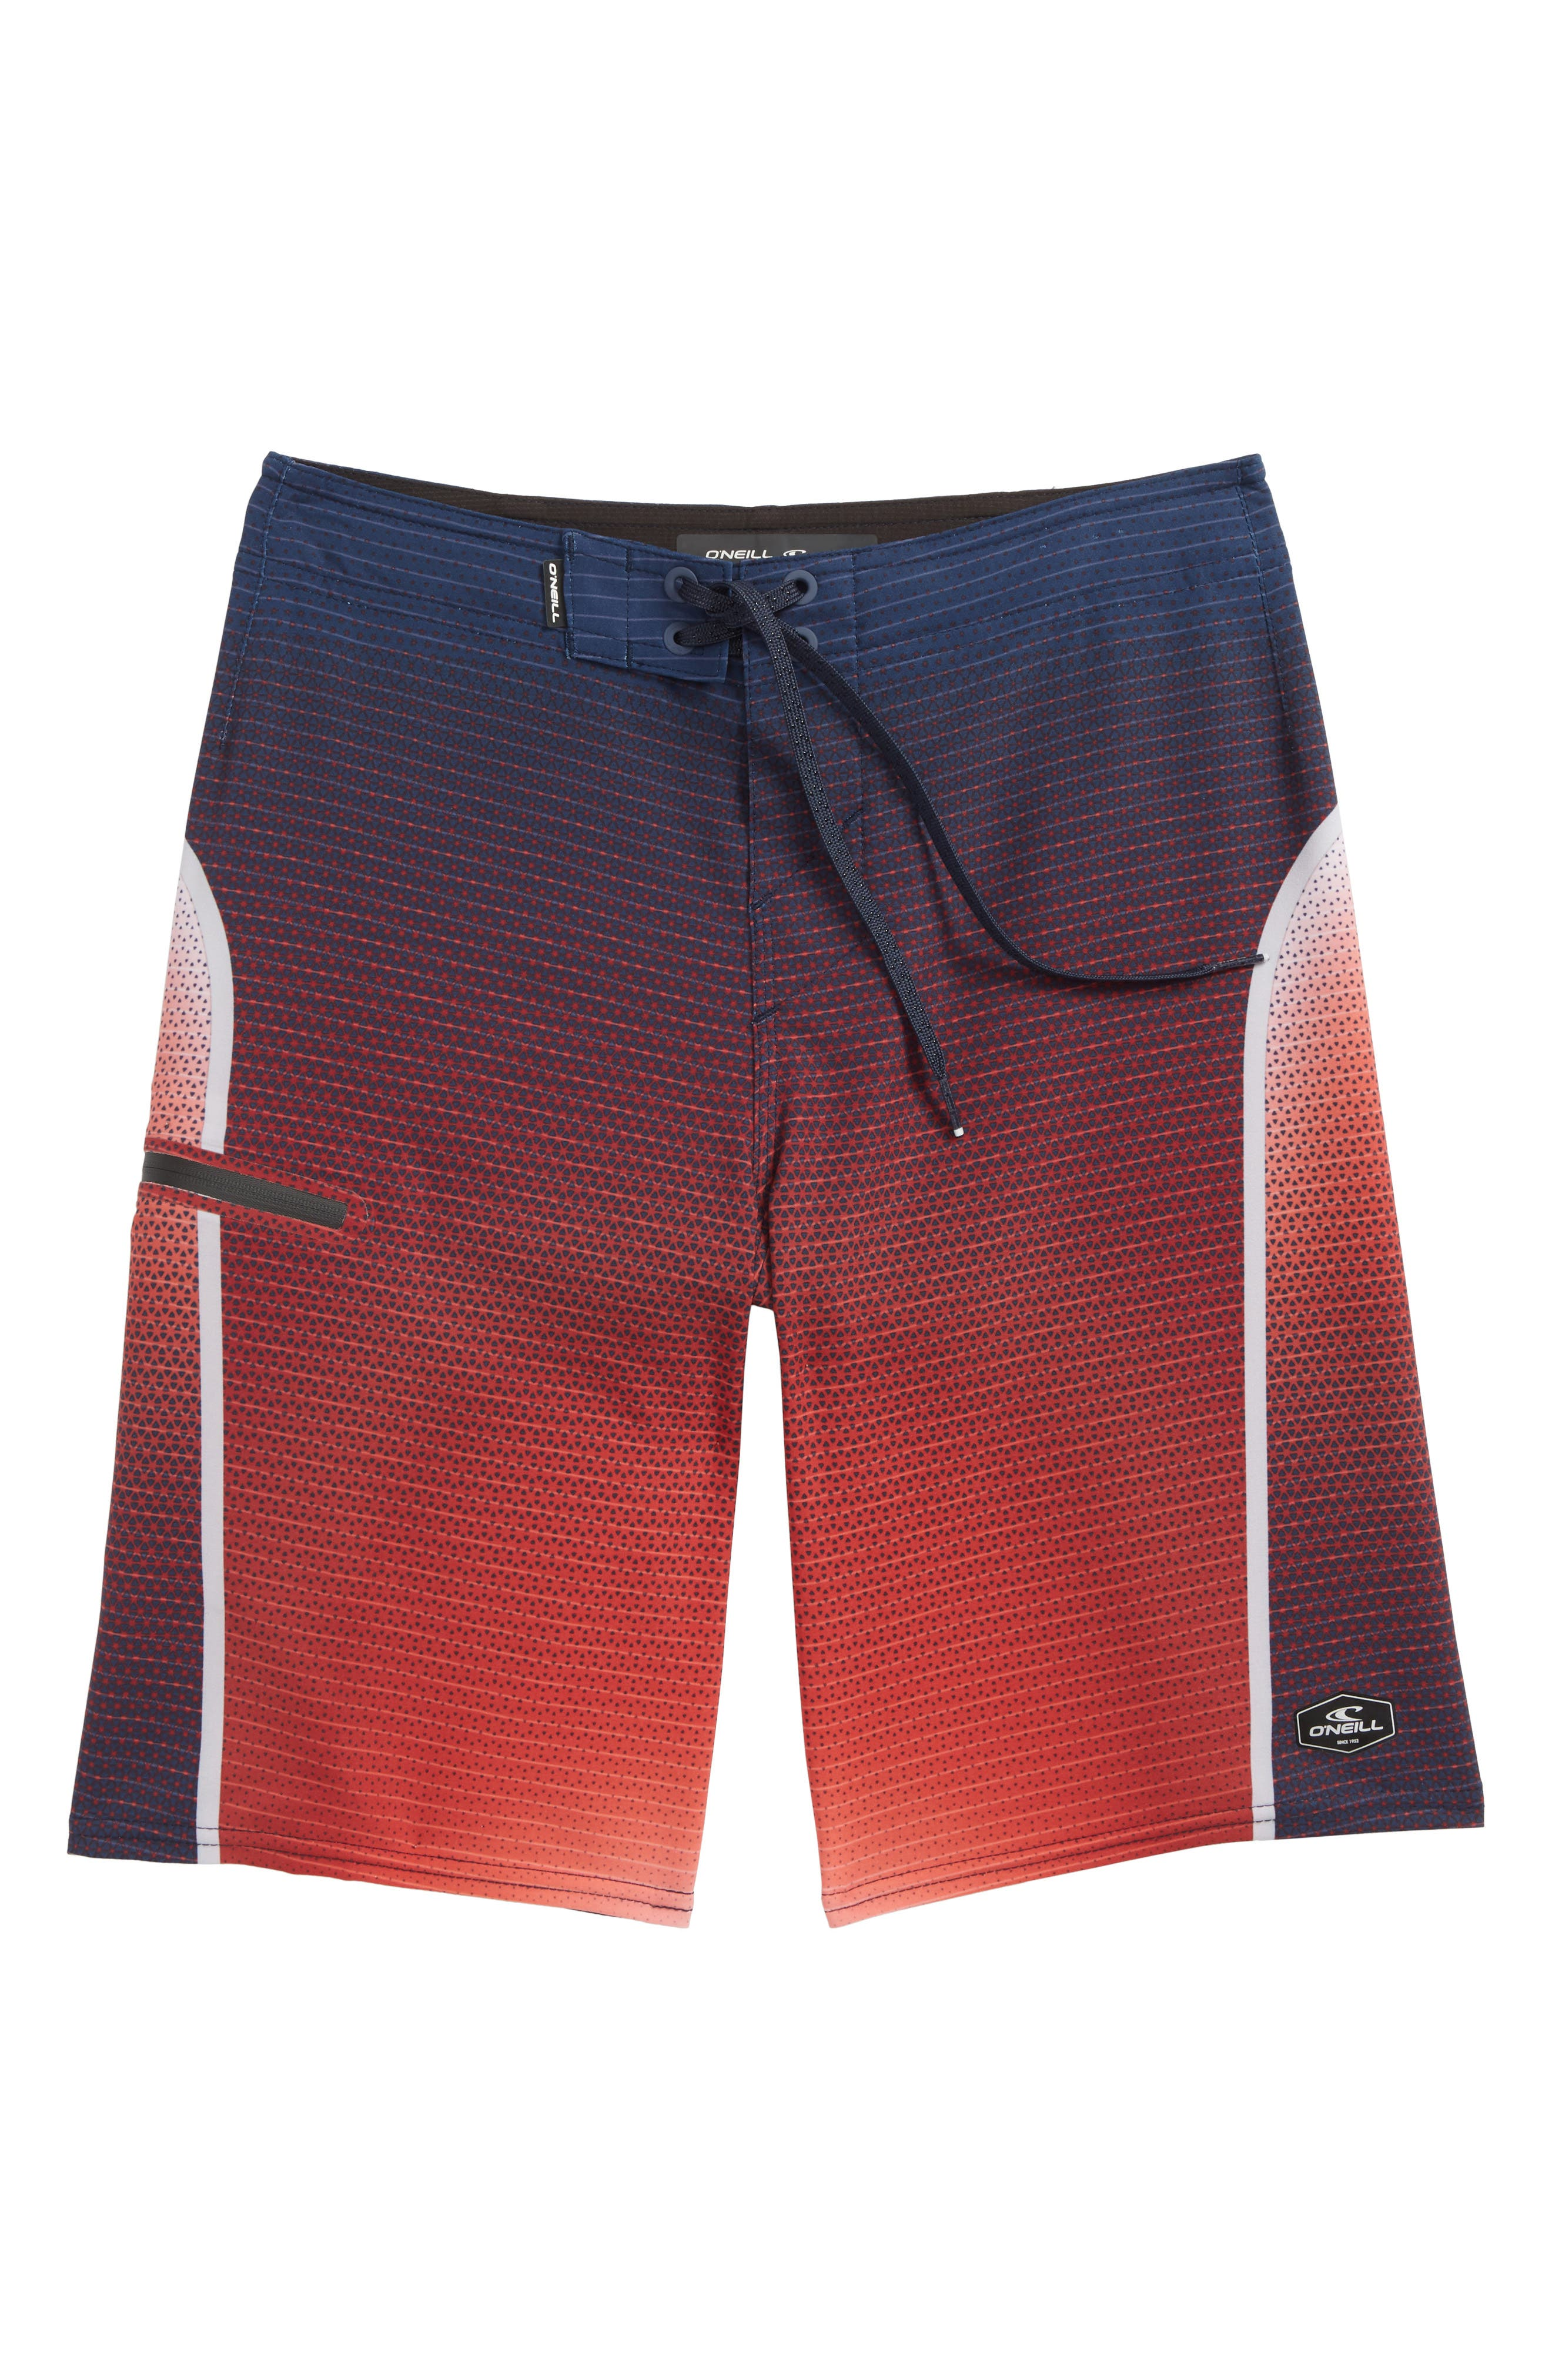 Hyperfreak Prizma Board Shorts,                         Main,                         color, Red